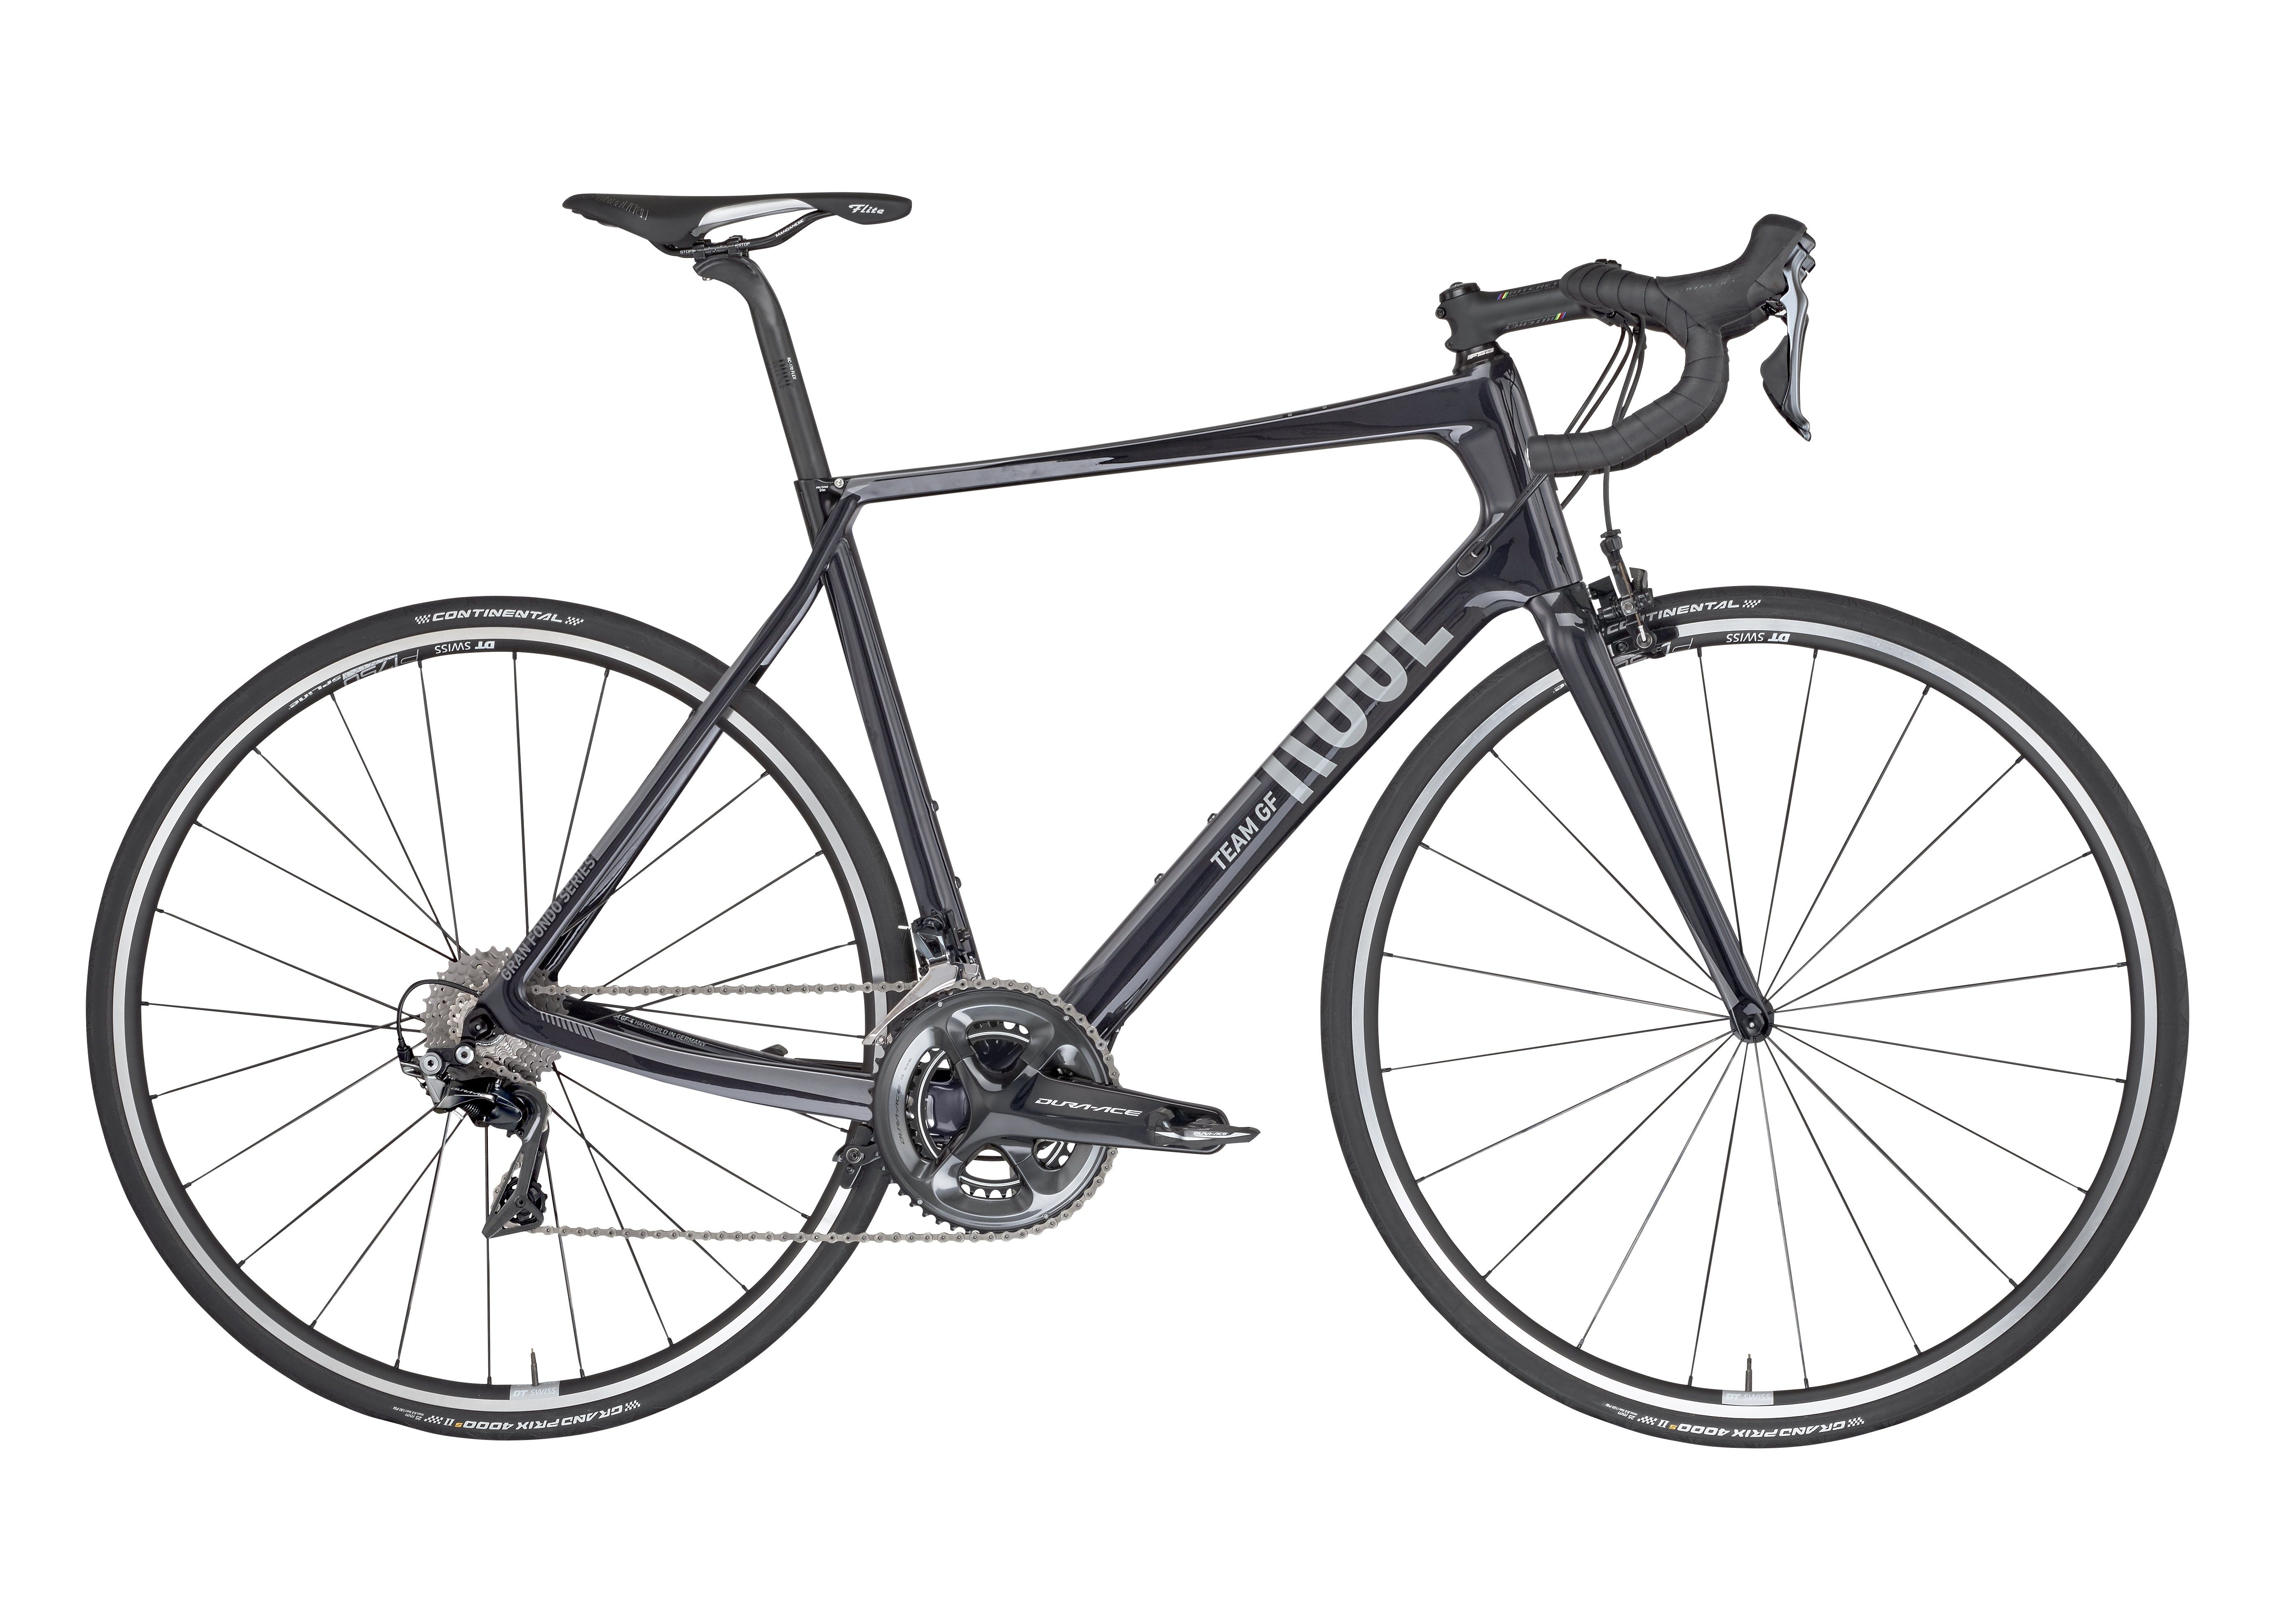 team gf 4 la nuova marathon rose bikes bdc. Black Bedroom Furniture Sets. Home Design Ideas